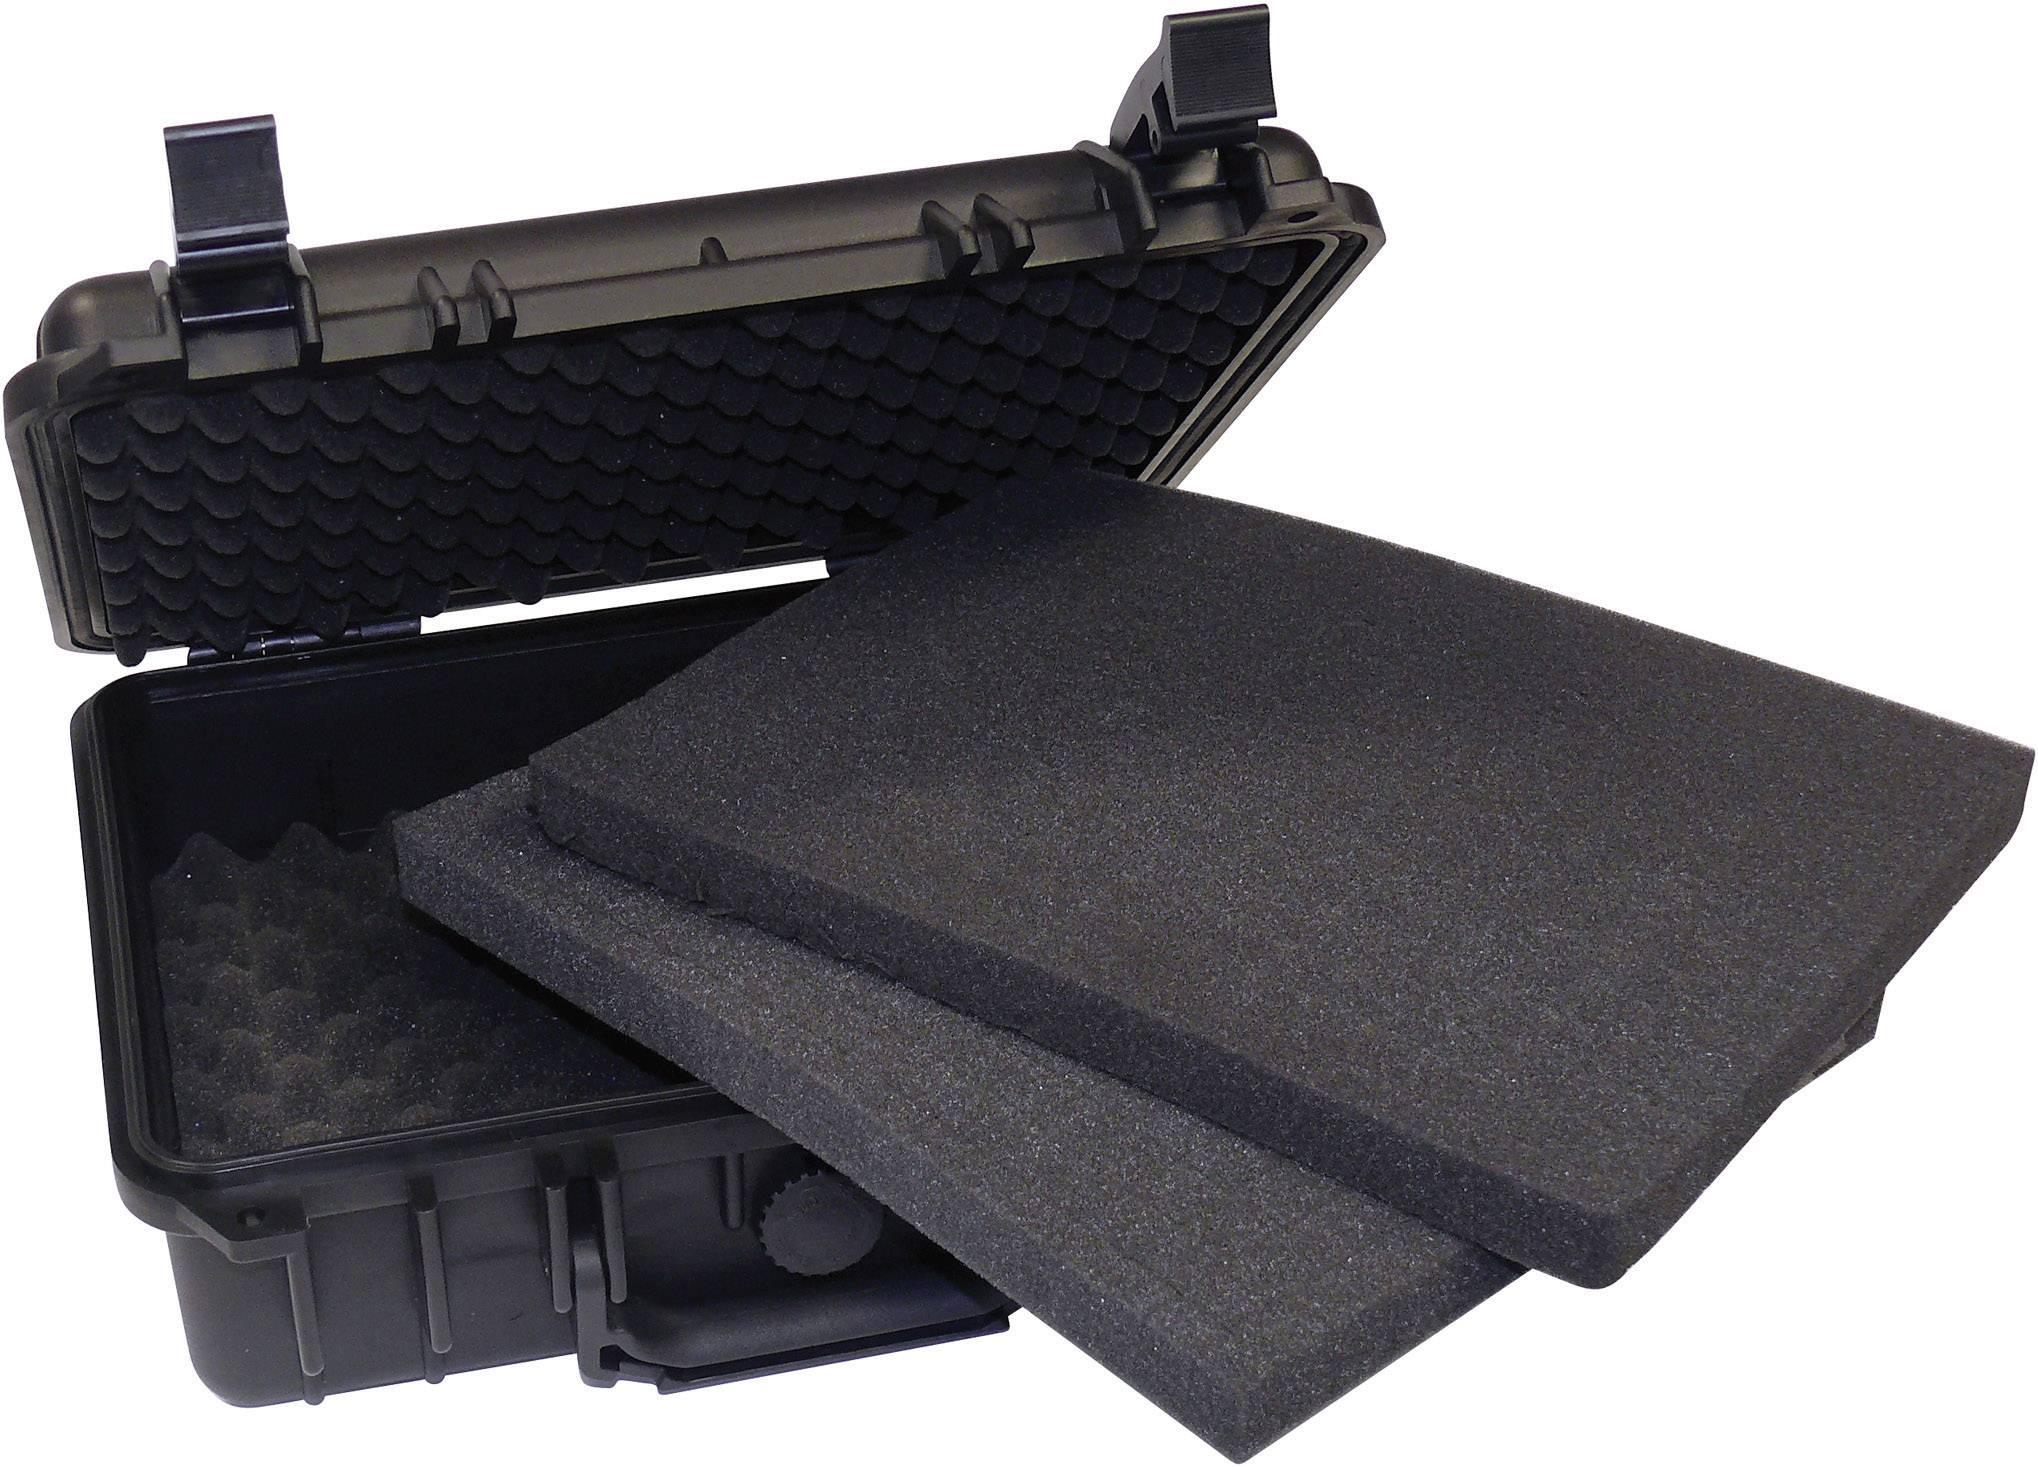 Ochranný kufor 206353, (d x š x v) 330 x 280 x 120 mm, čierna